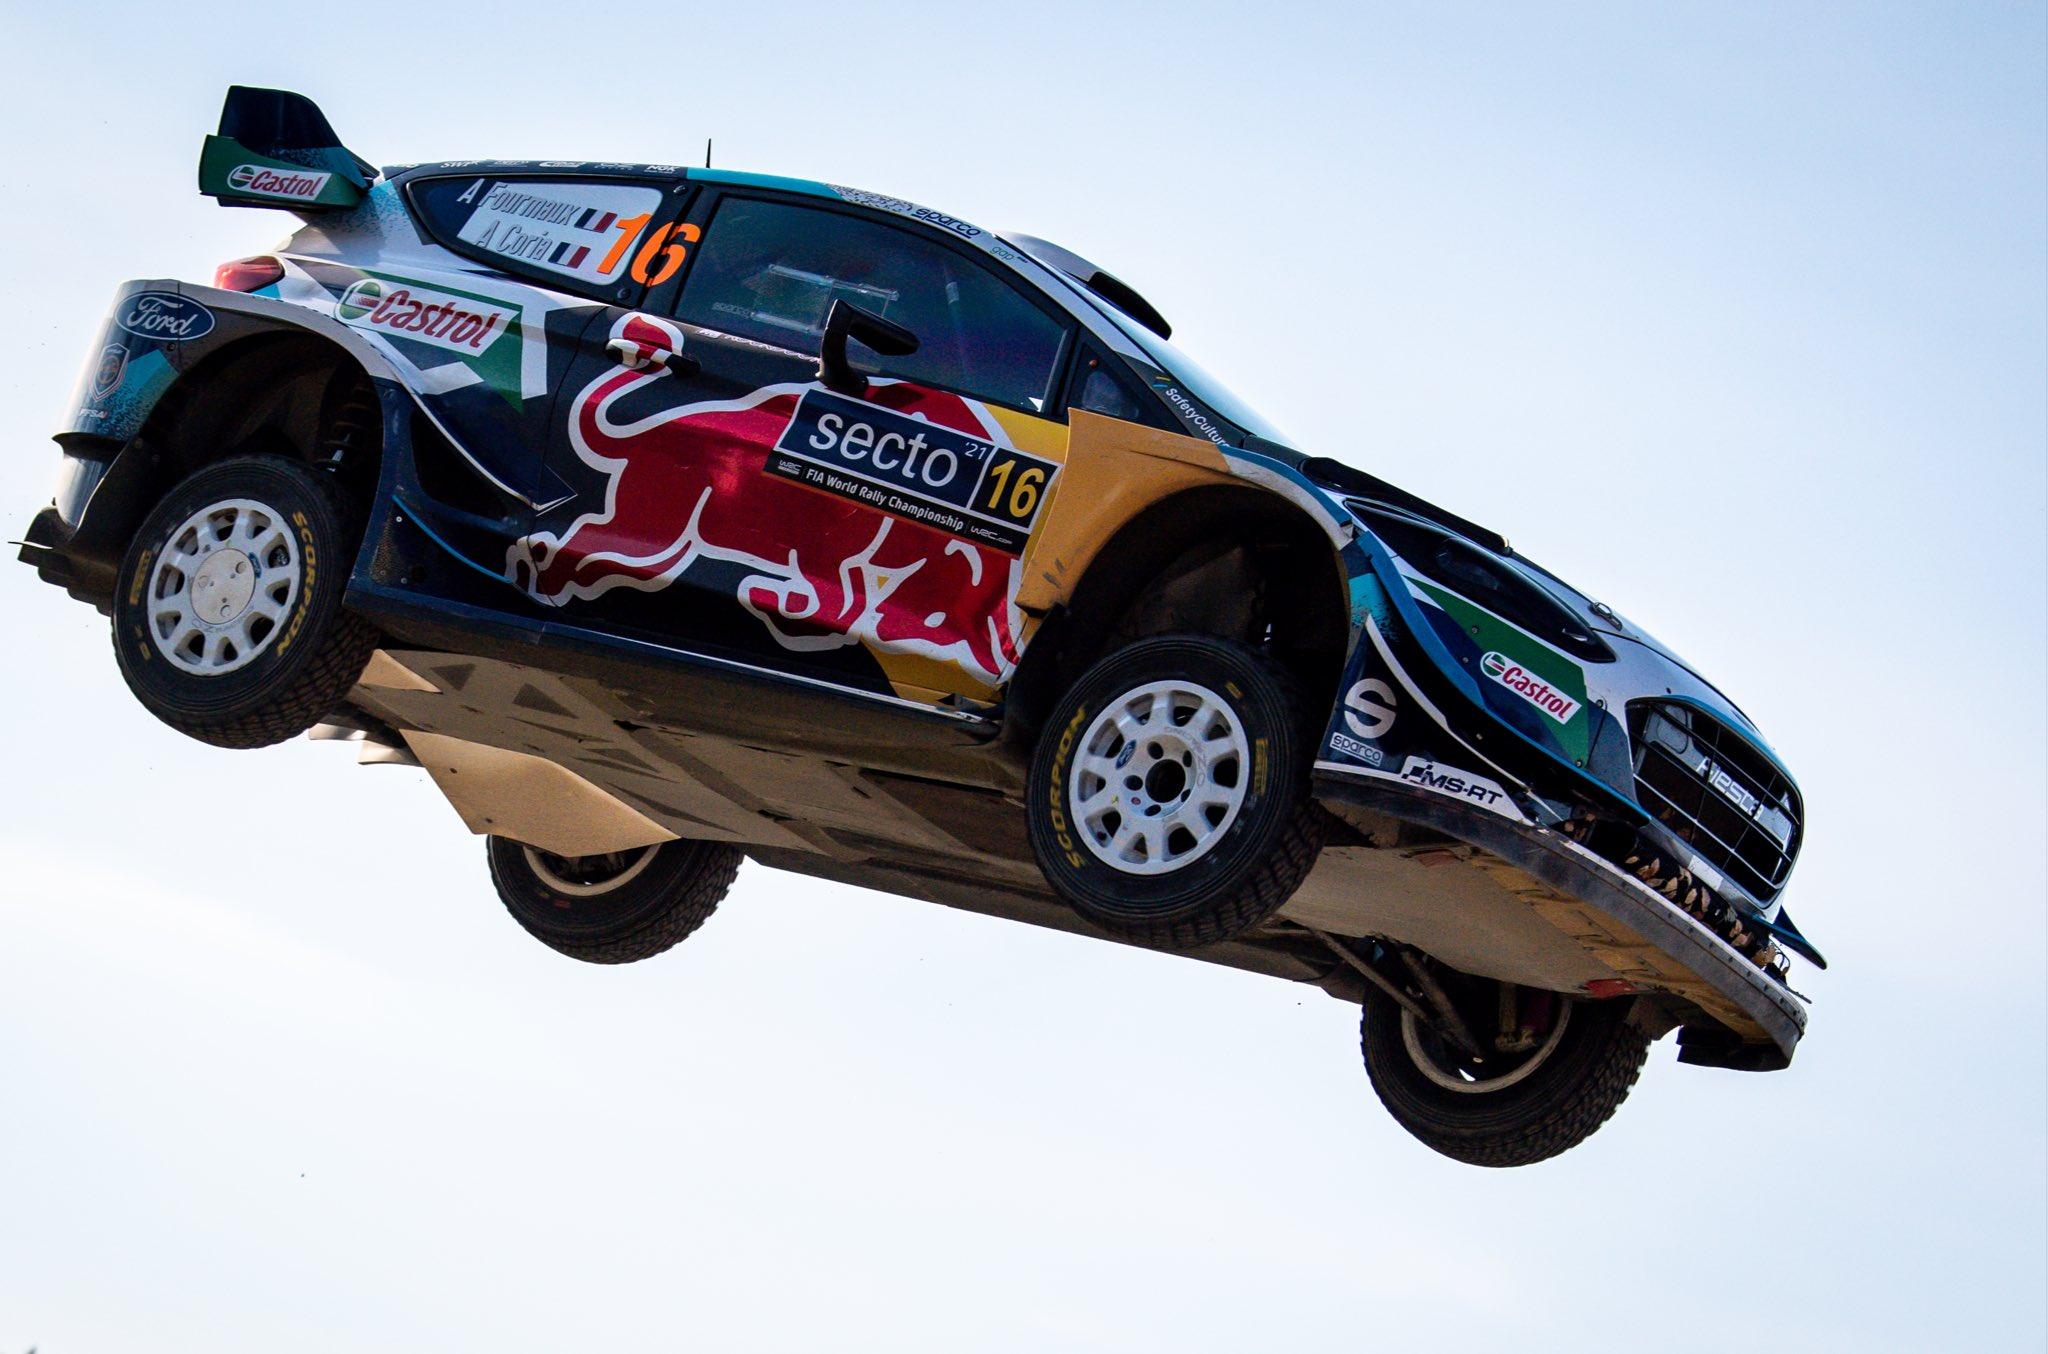 WRC: 70º SECTO Rally Finland [1-3 Octubre] - Página 3 FA3KdaGX0AAQw6Z?format=jpg&name=large